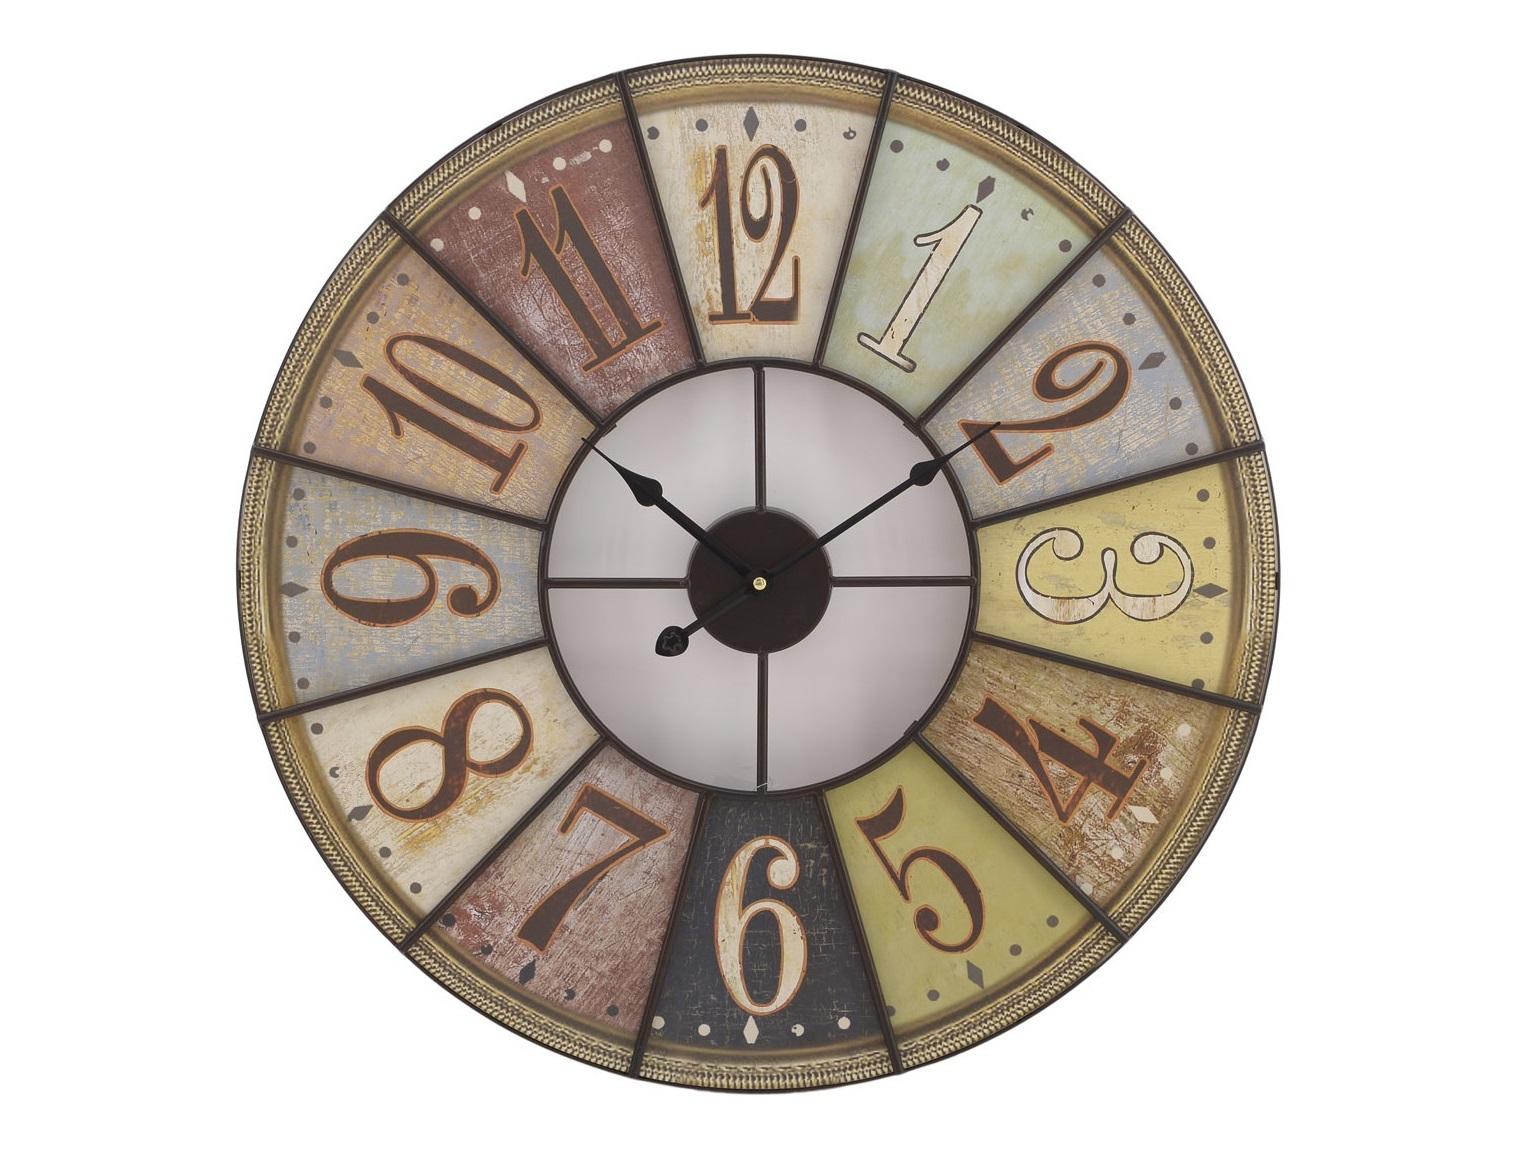 Часы настенные BerazateguiНастенные часы<br>Часы настенные - кварцевый механизм<br><br>Material: Металл<br>Width см: None<br>Depth см: 4<br>Height см: None<br>Diameter см: 58